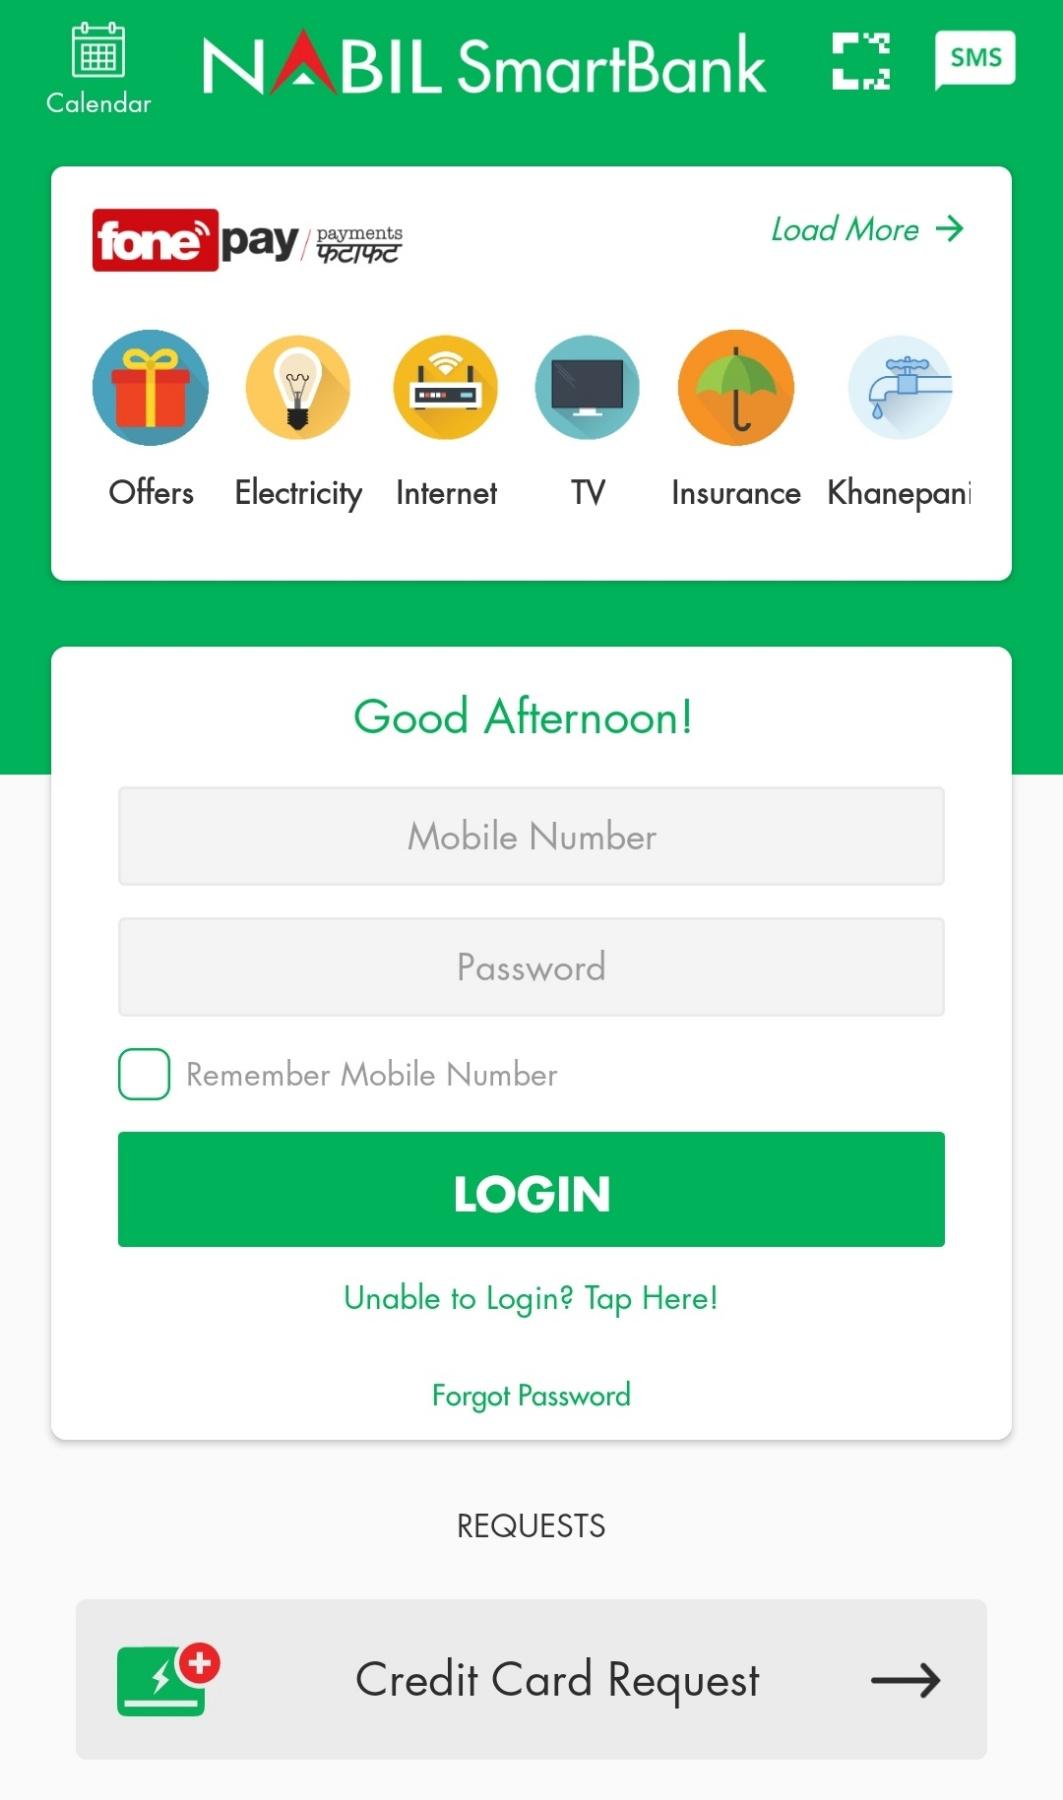 Nabil Smart Bank login